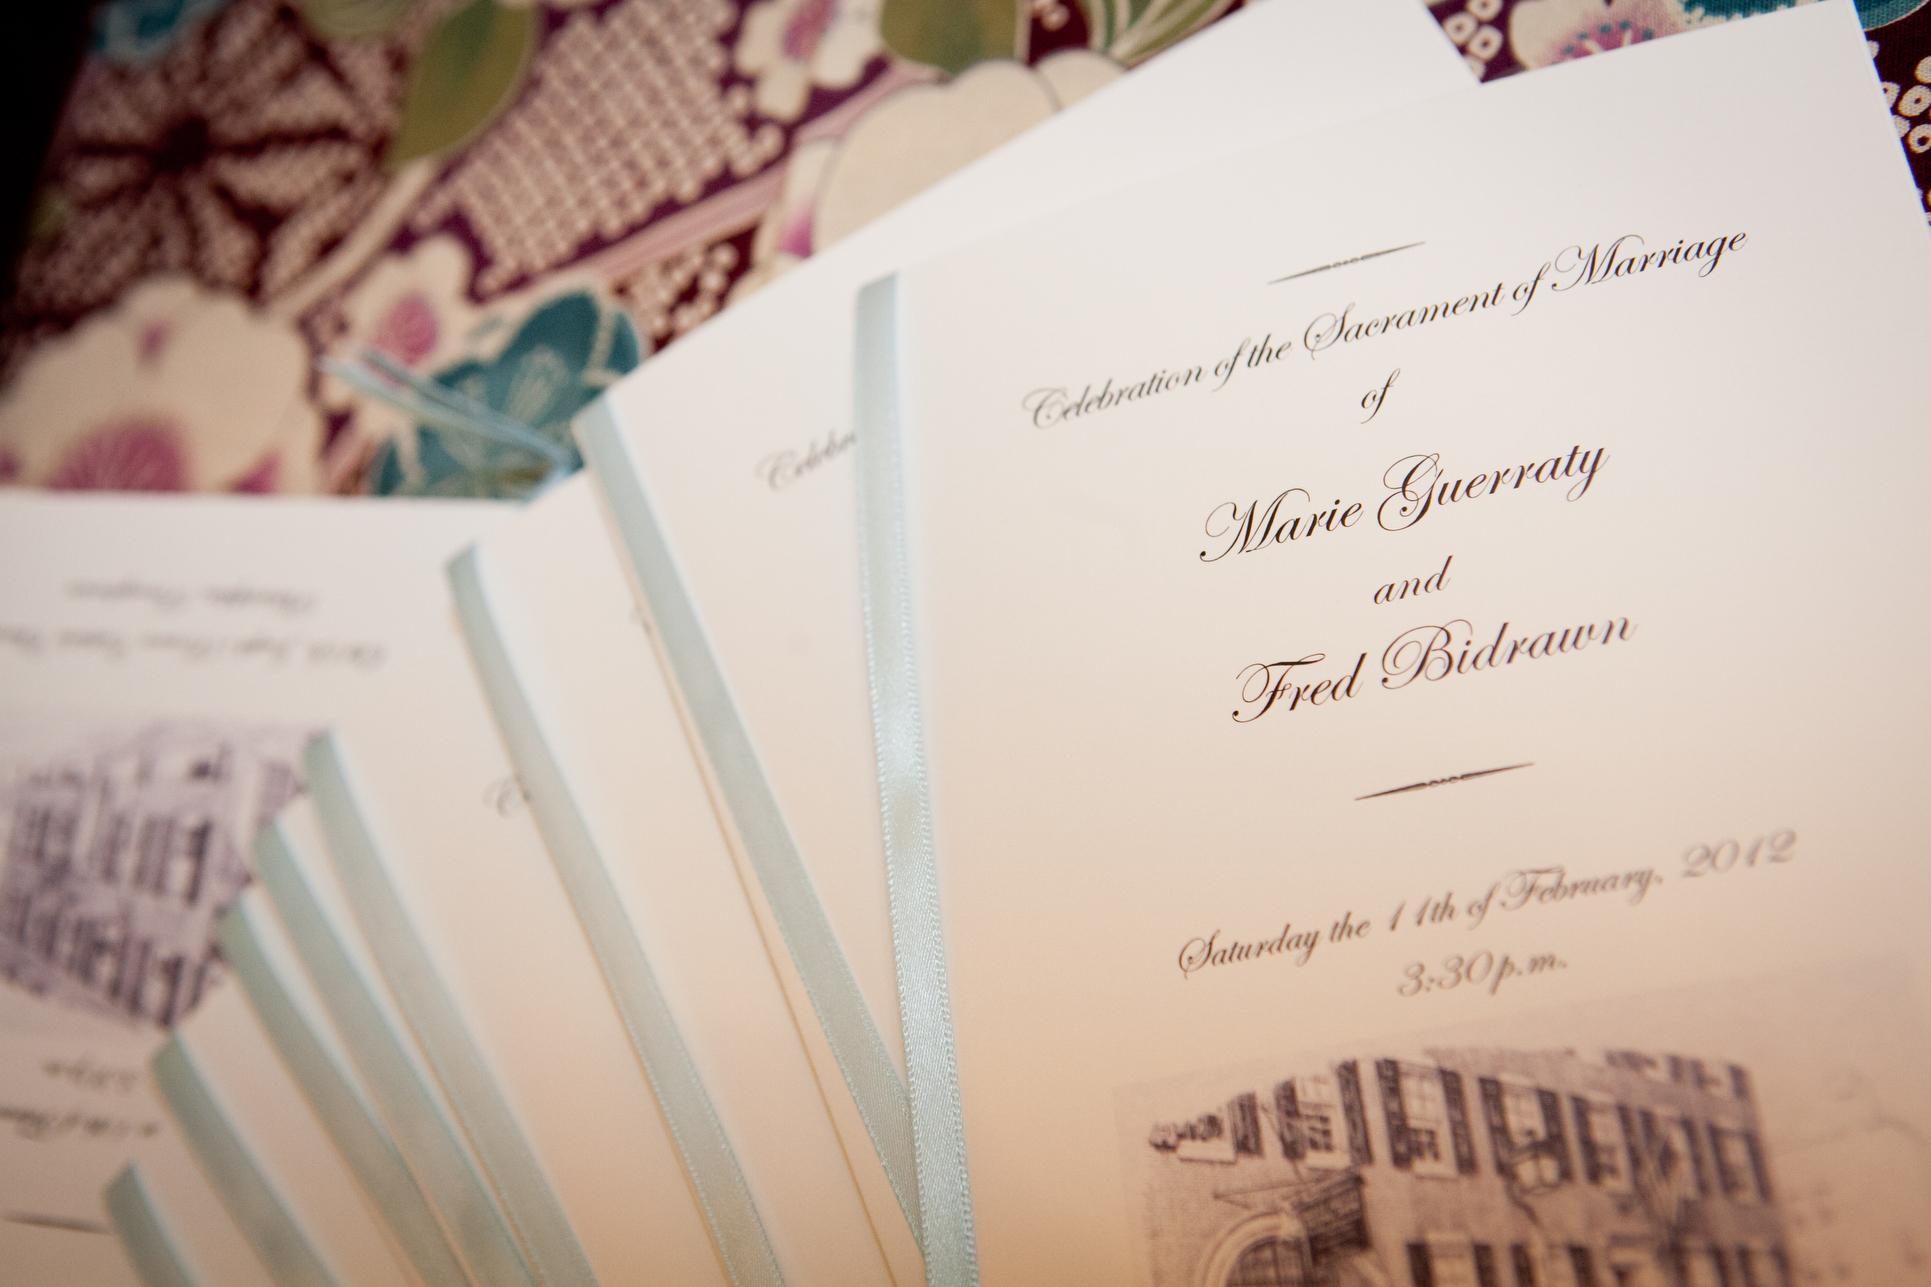 13 Old St Josephs Philadelphia Wedding Ceremony Programs.JPG